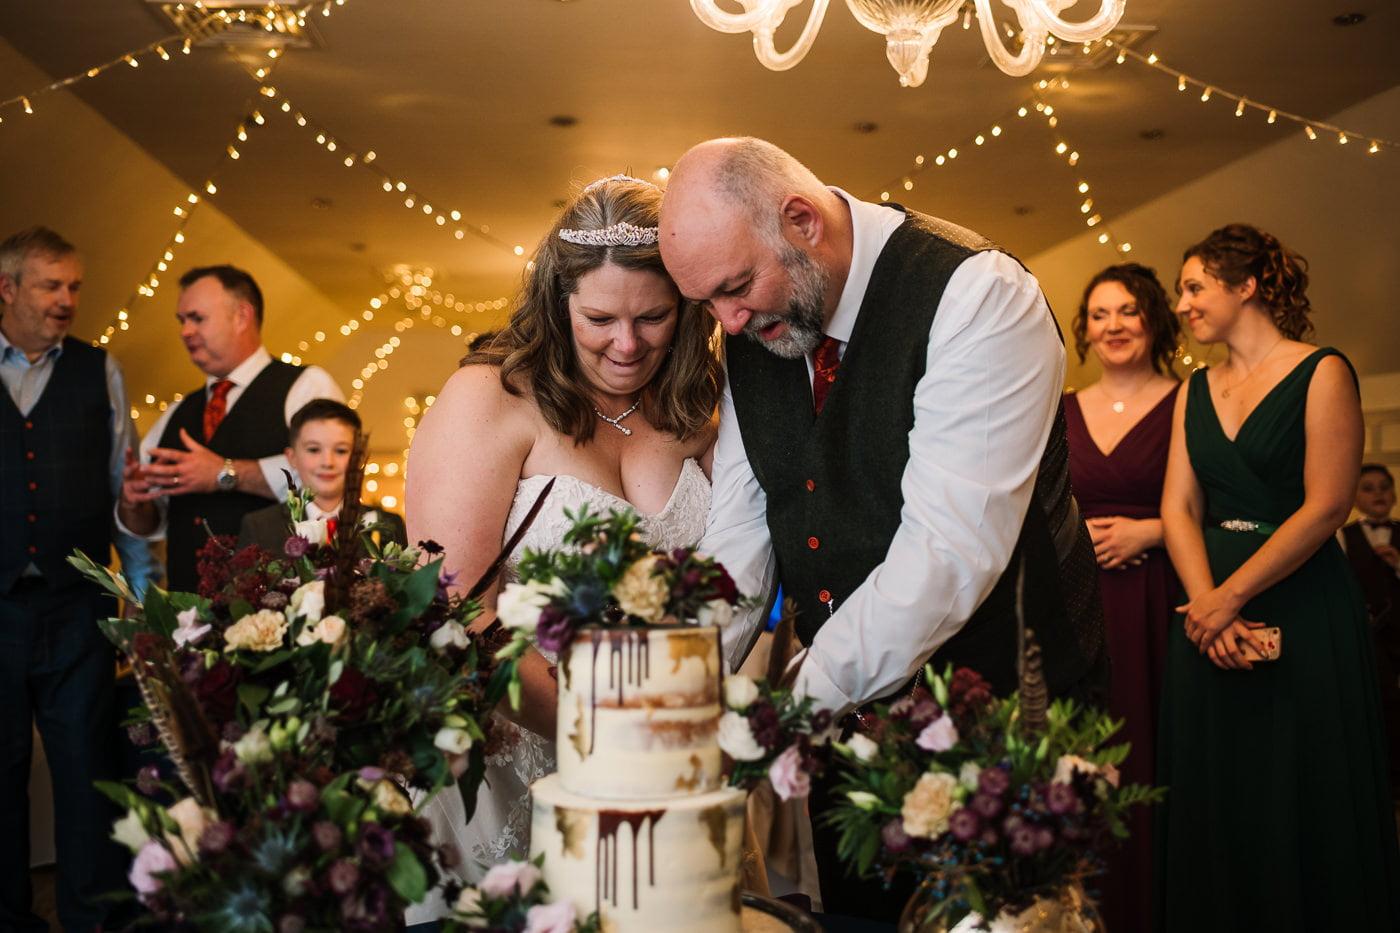 Cake by Cake Love in Ringwood